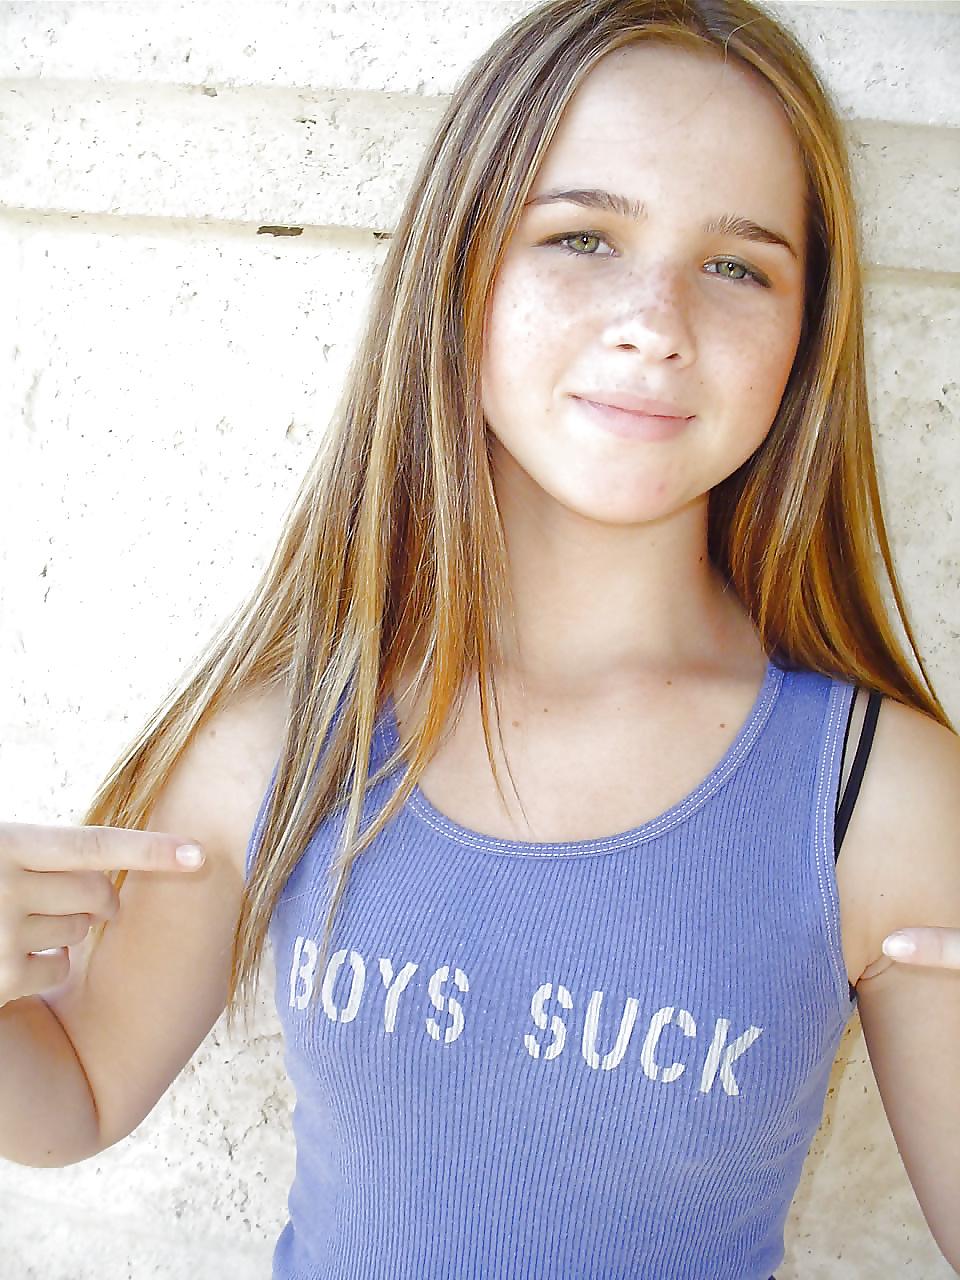 Bbs russian teen girls nude girl